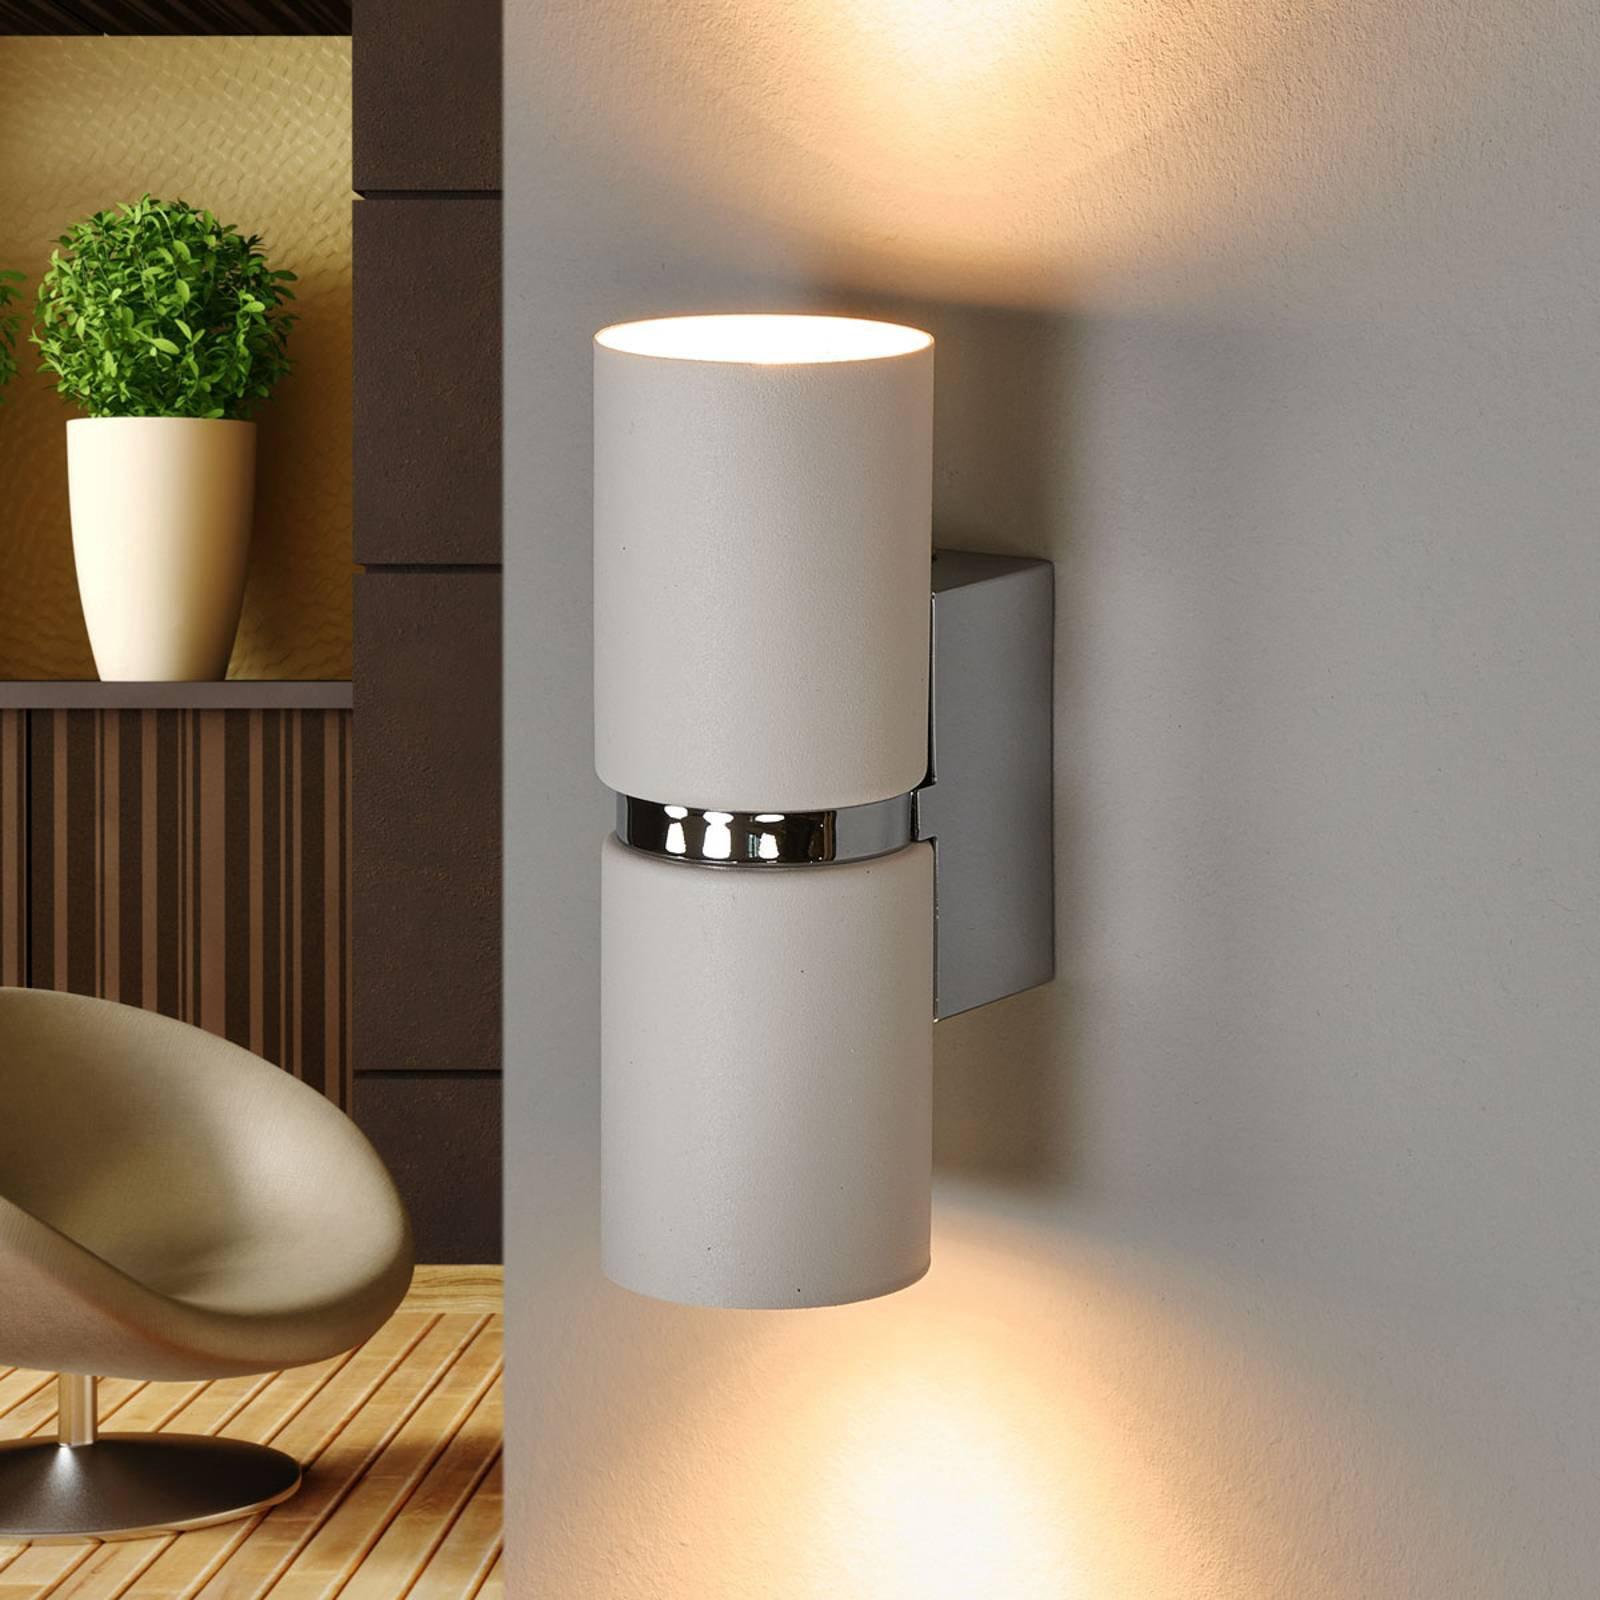 LED-vegglampe Passa, rund, hvit